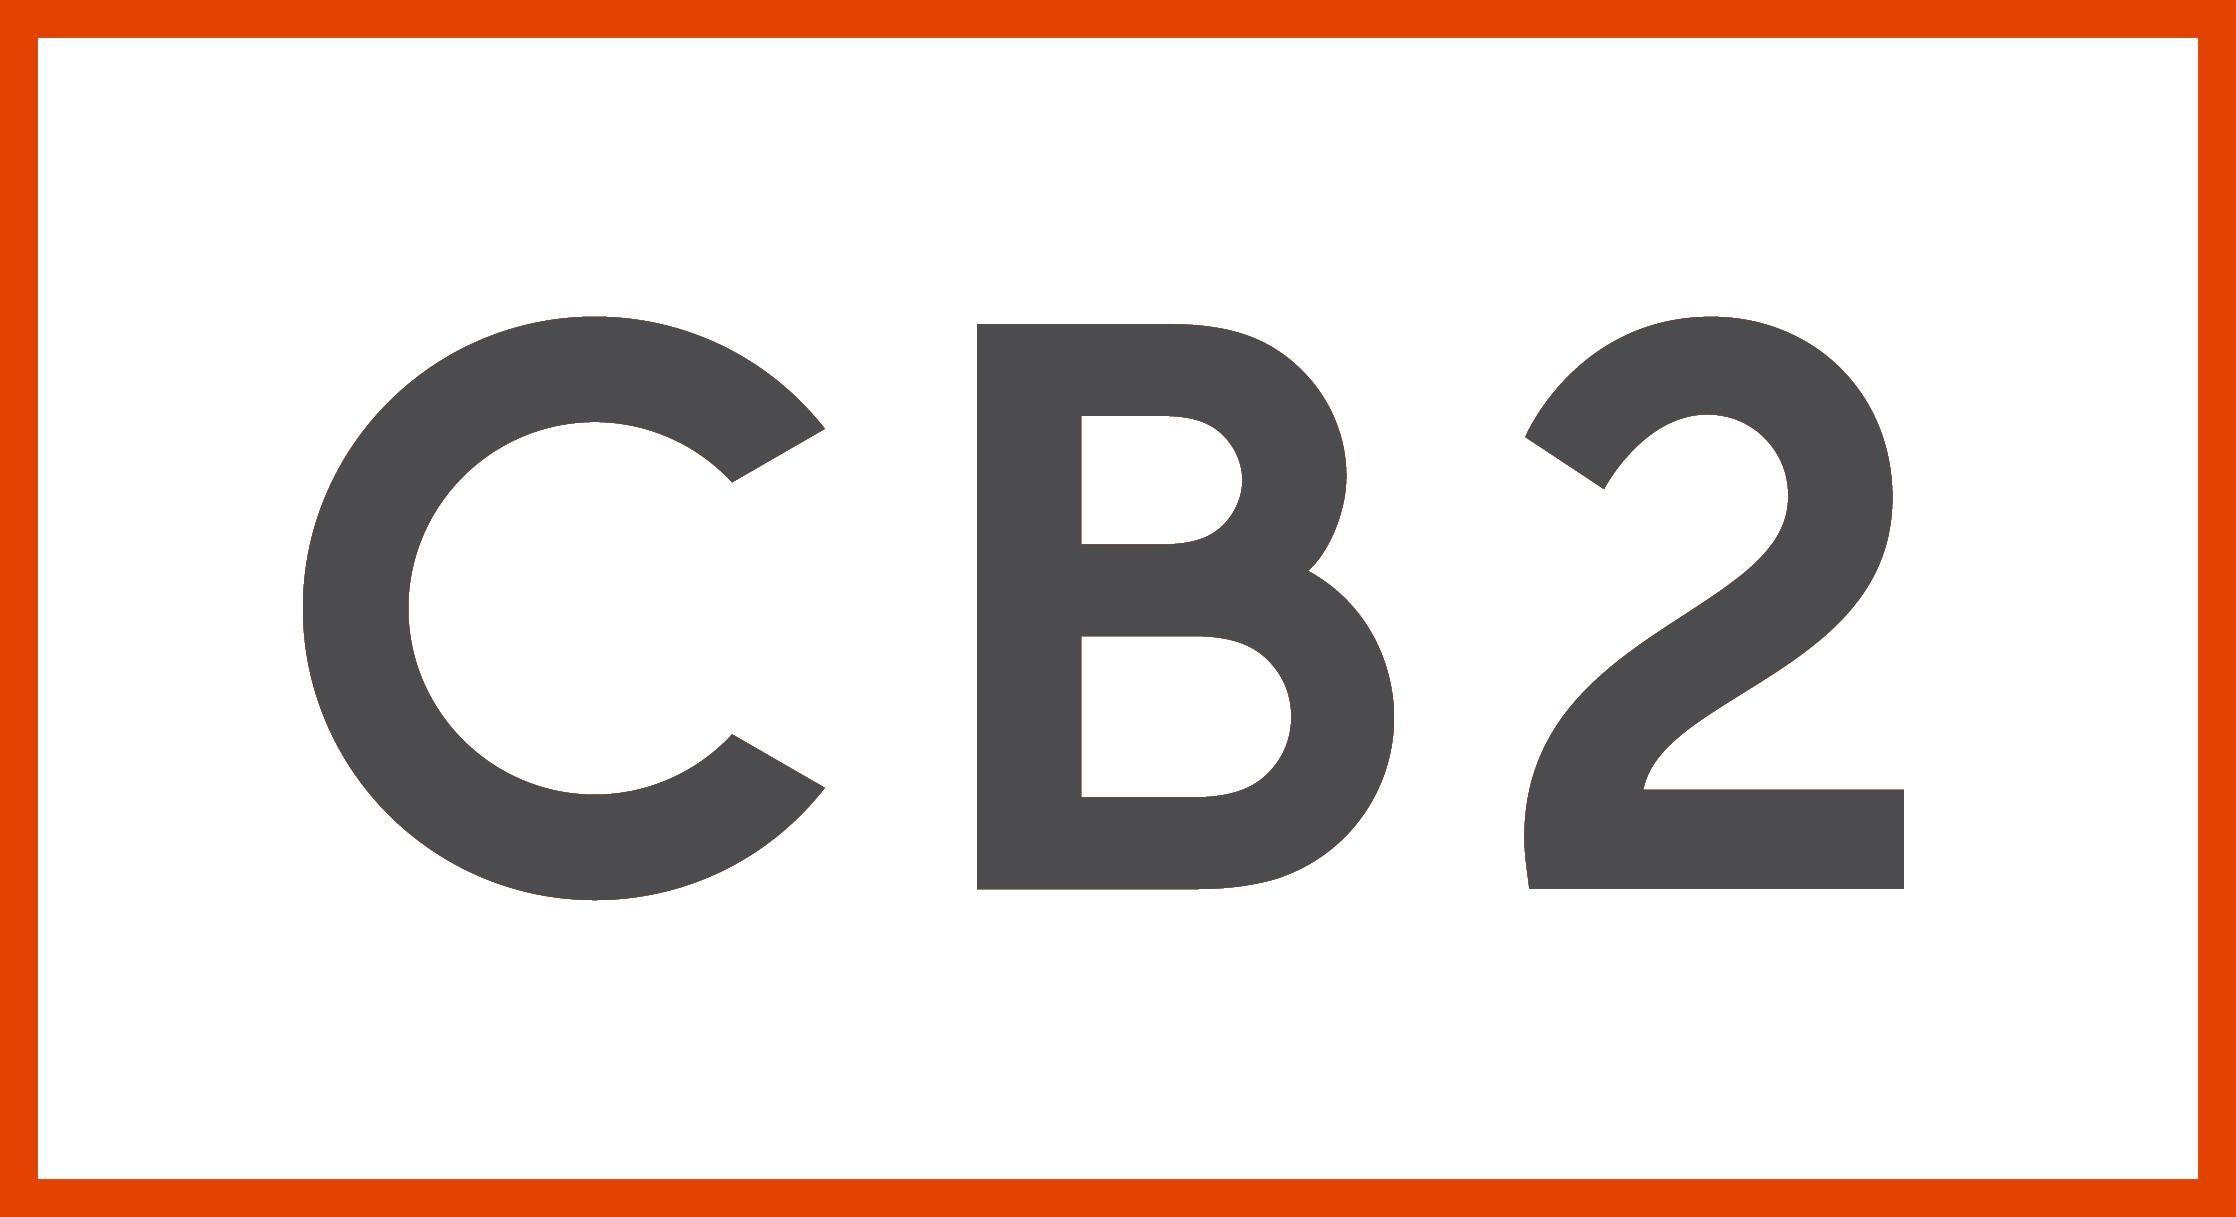 CB2 400x400 Logo